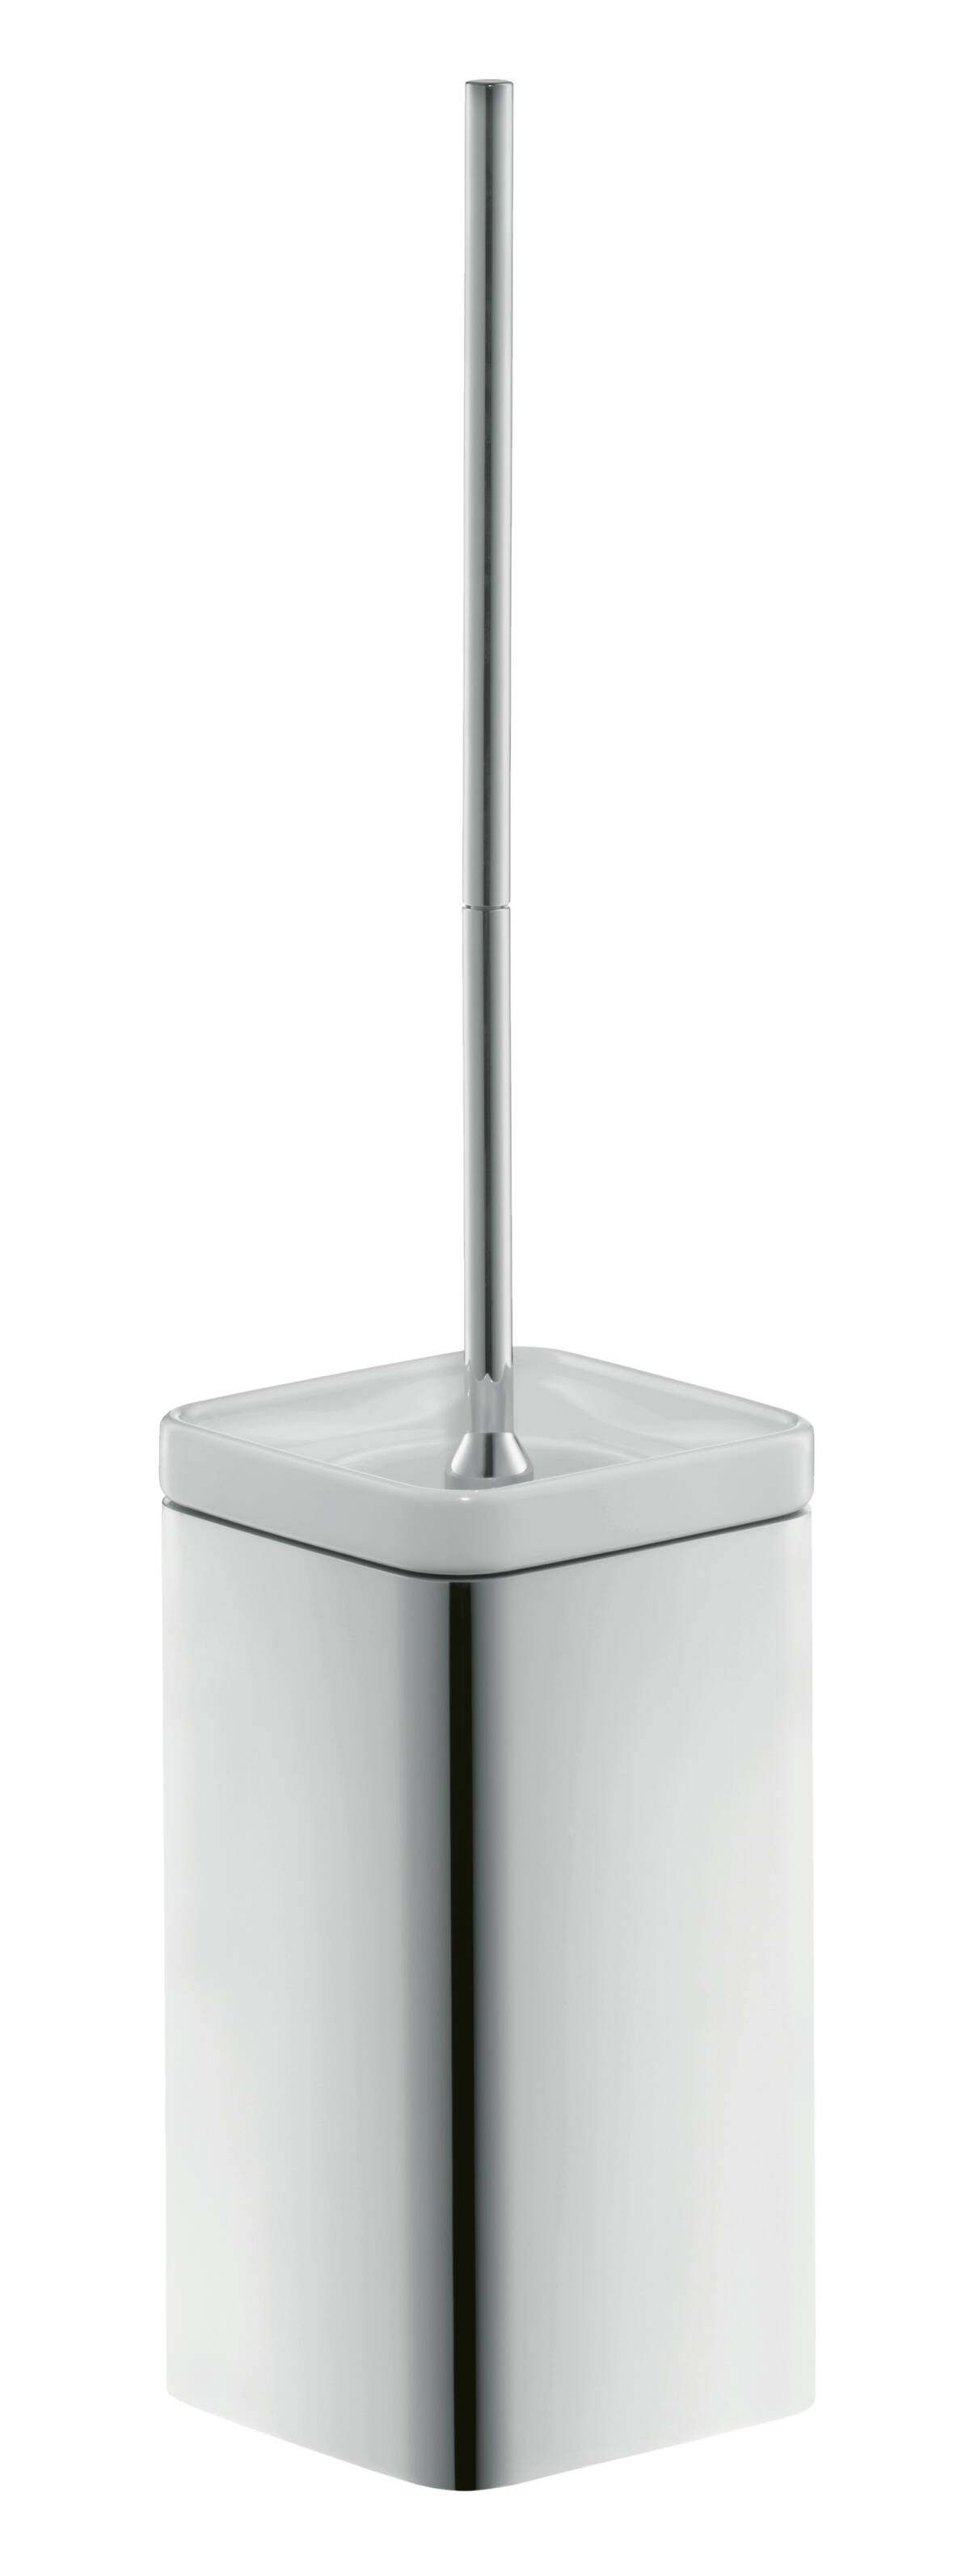 WC Bürstenhalter Wandversion, Chrom, 42435000